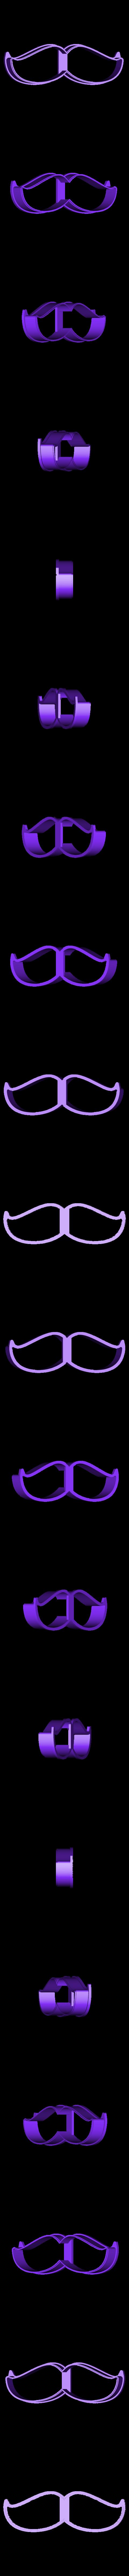 00803 usi N2.obj Download OBJ file Mustache 2 cookie cutter for professional • 3D printer model, gleblubin